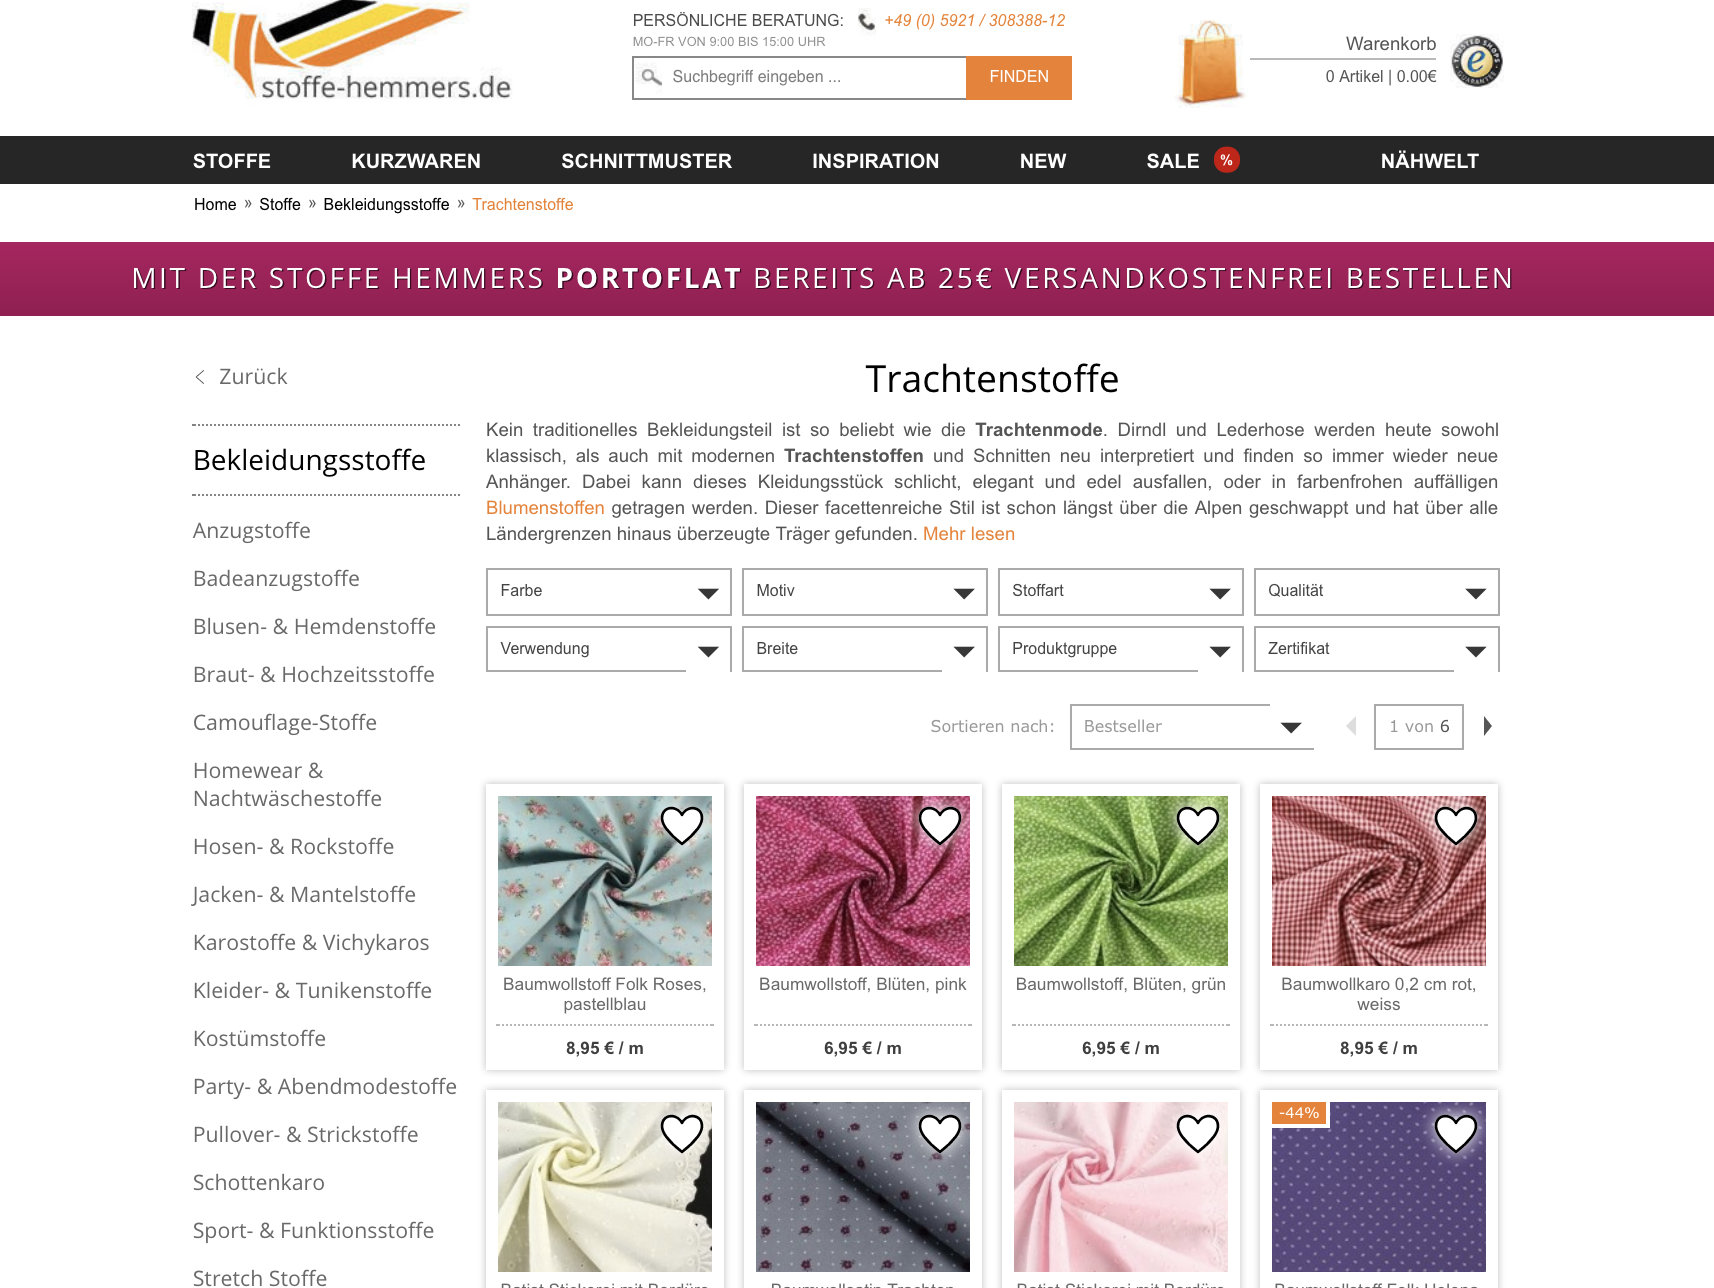 trachtenstoffe online kaufen bersicht online shops. Black Bedroom Furniture Sets. Home Design Ideas